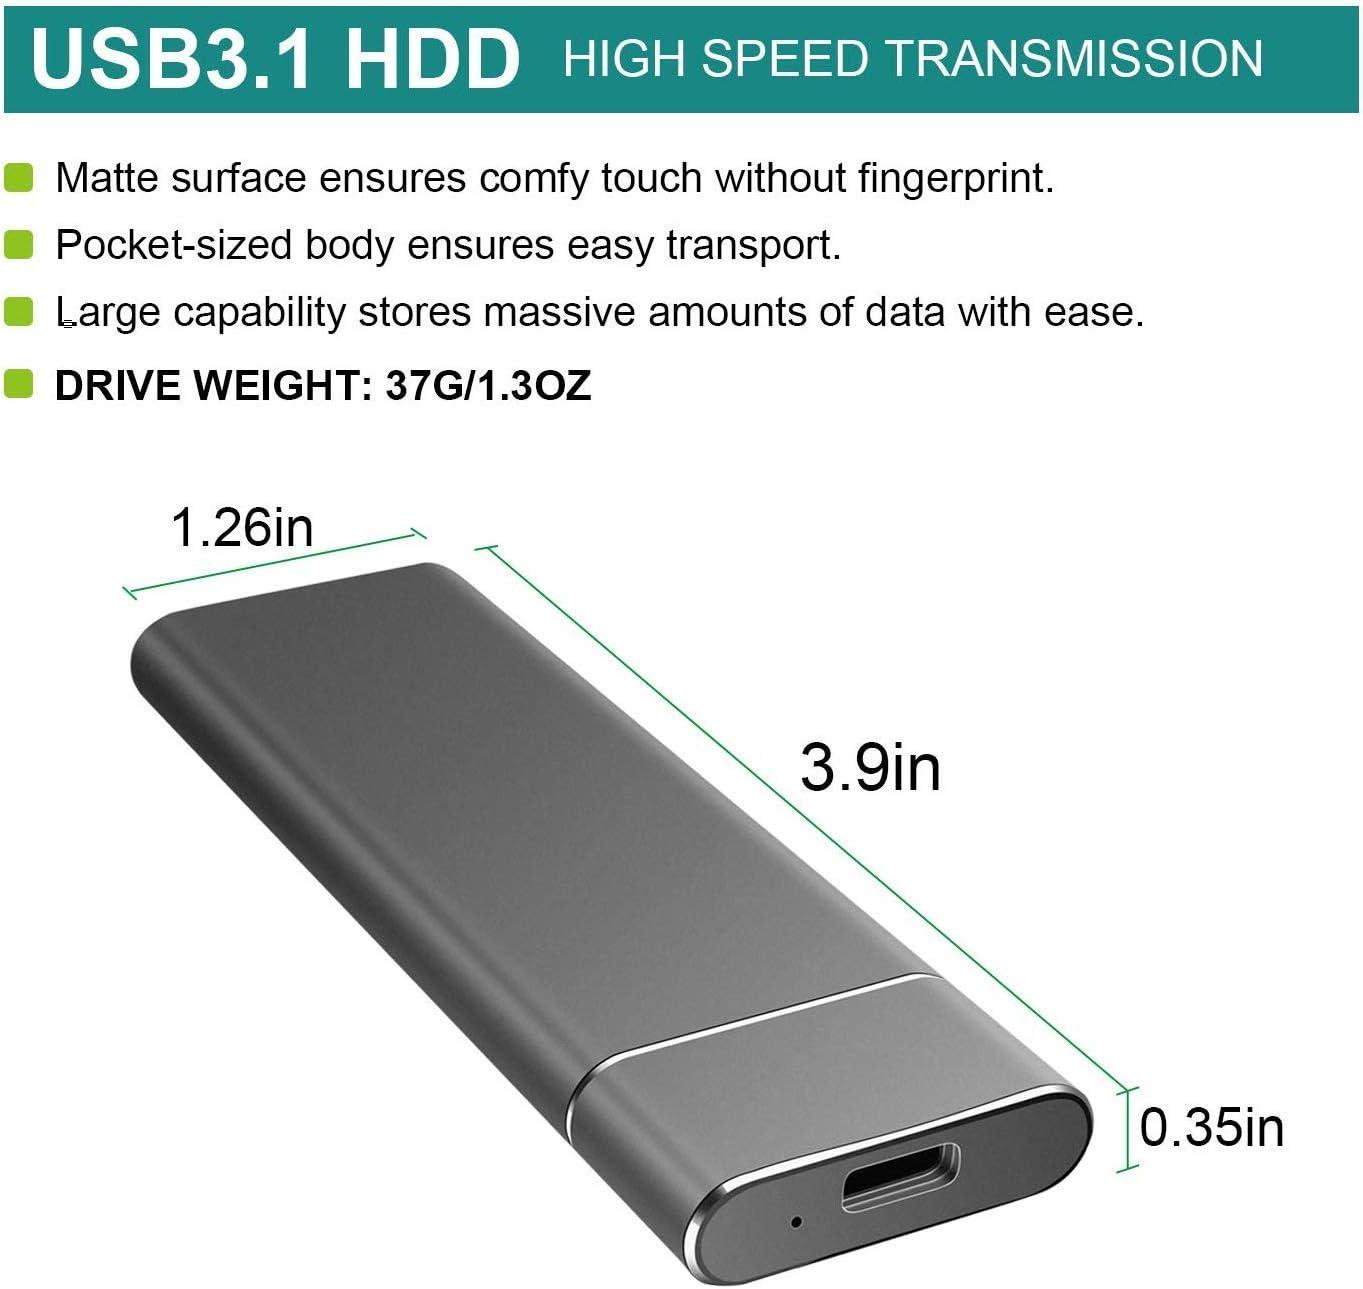 2TB, Blue Mac Xbox One Apple Windows DETAMM External Hard Drive Portable Ultra Slim Type C USB 3.1 Hard Drive for PC